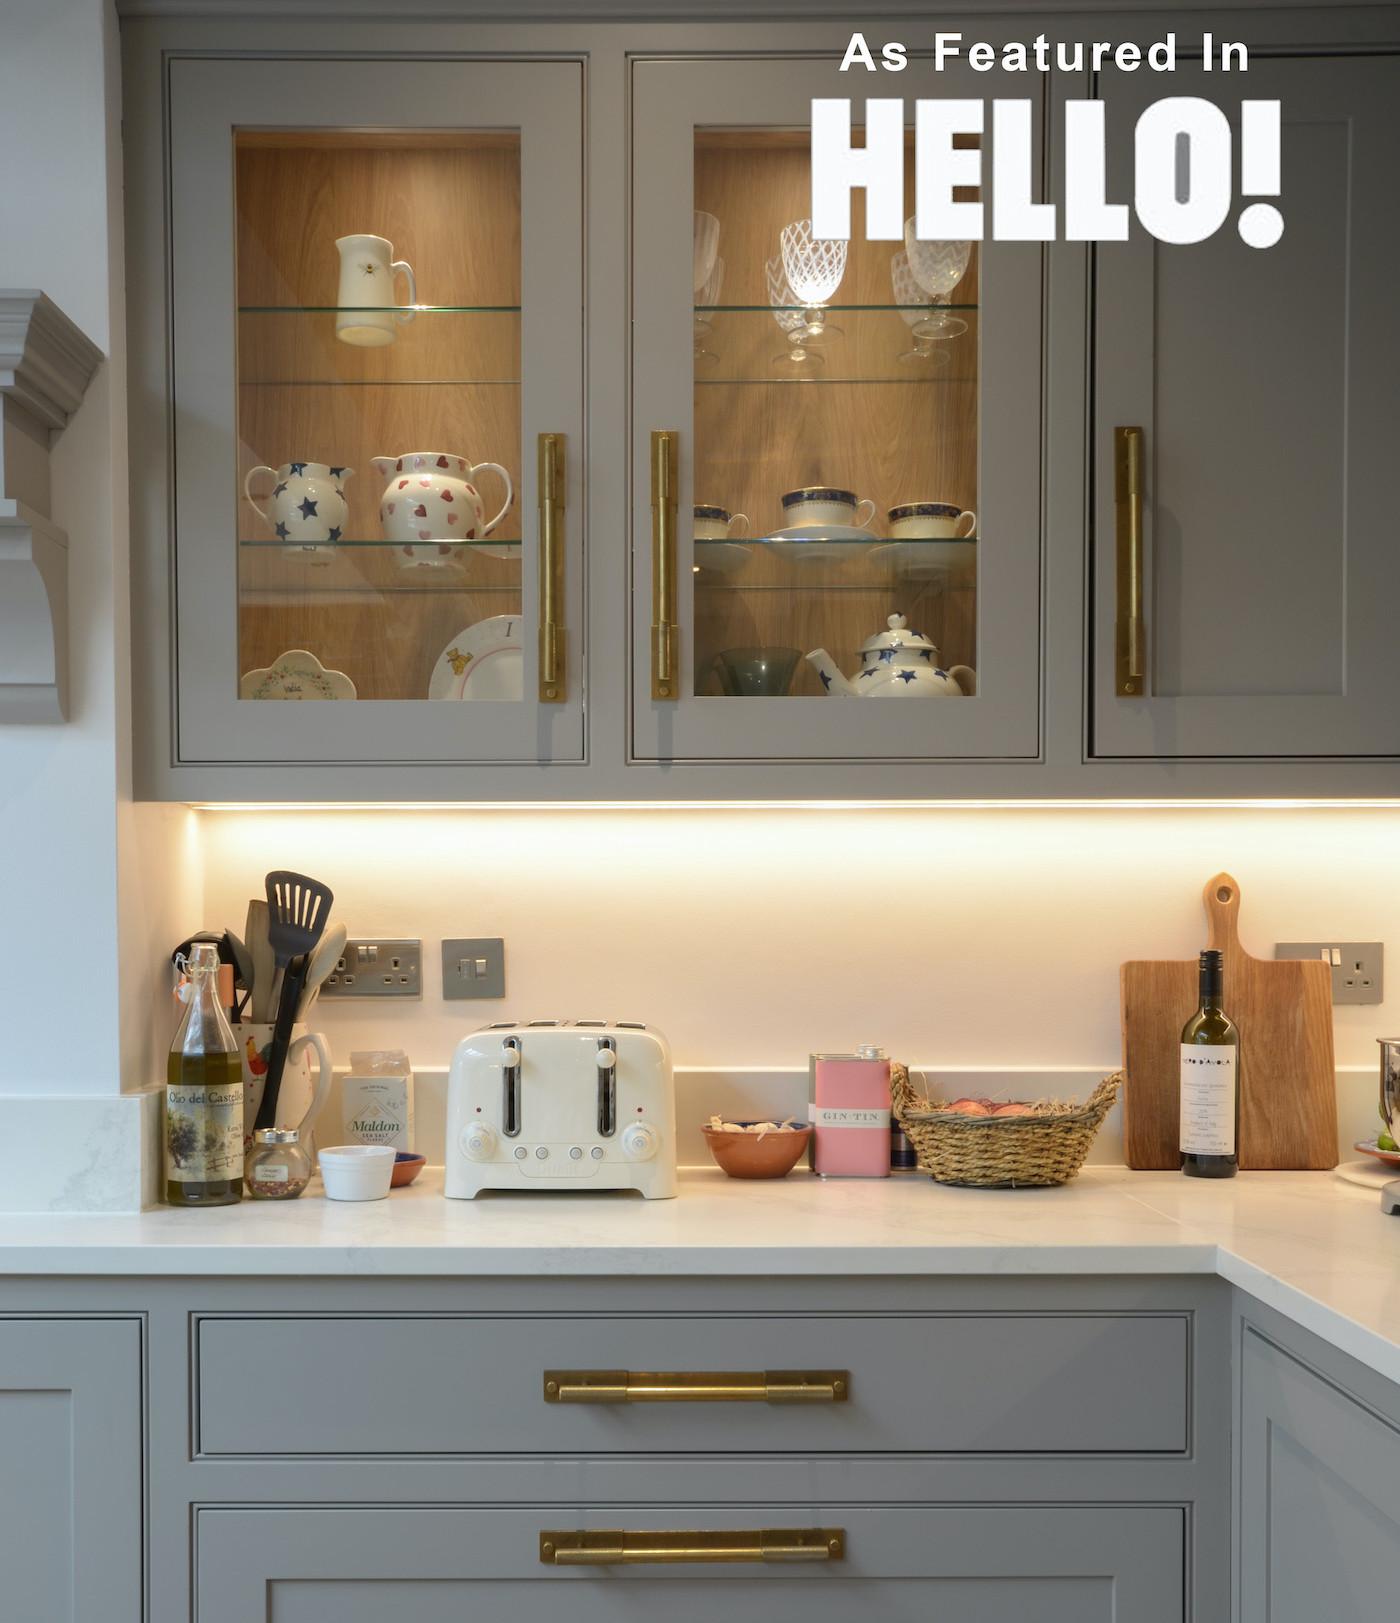 kitchen drawers, hello magazine, teapot